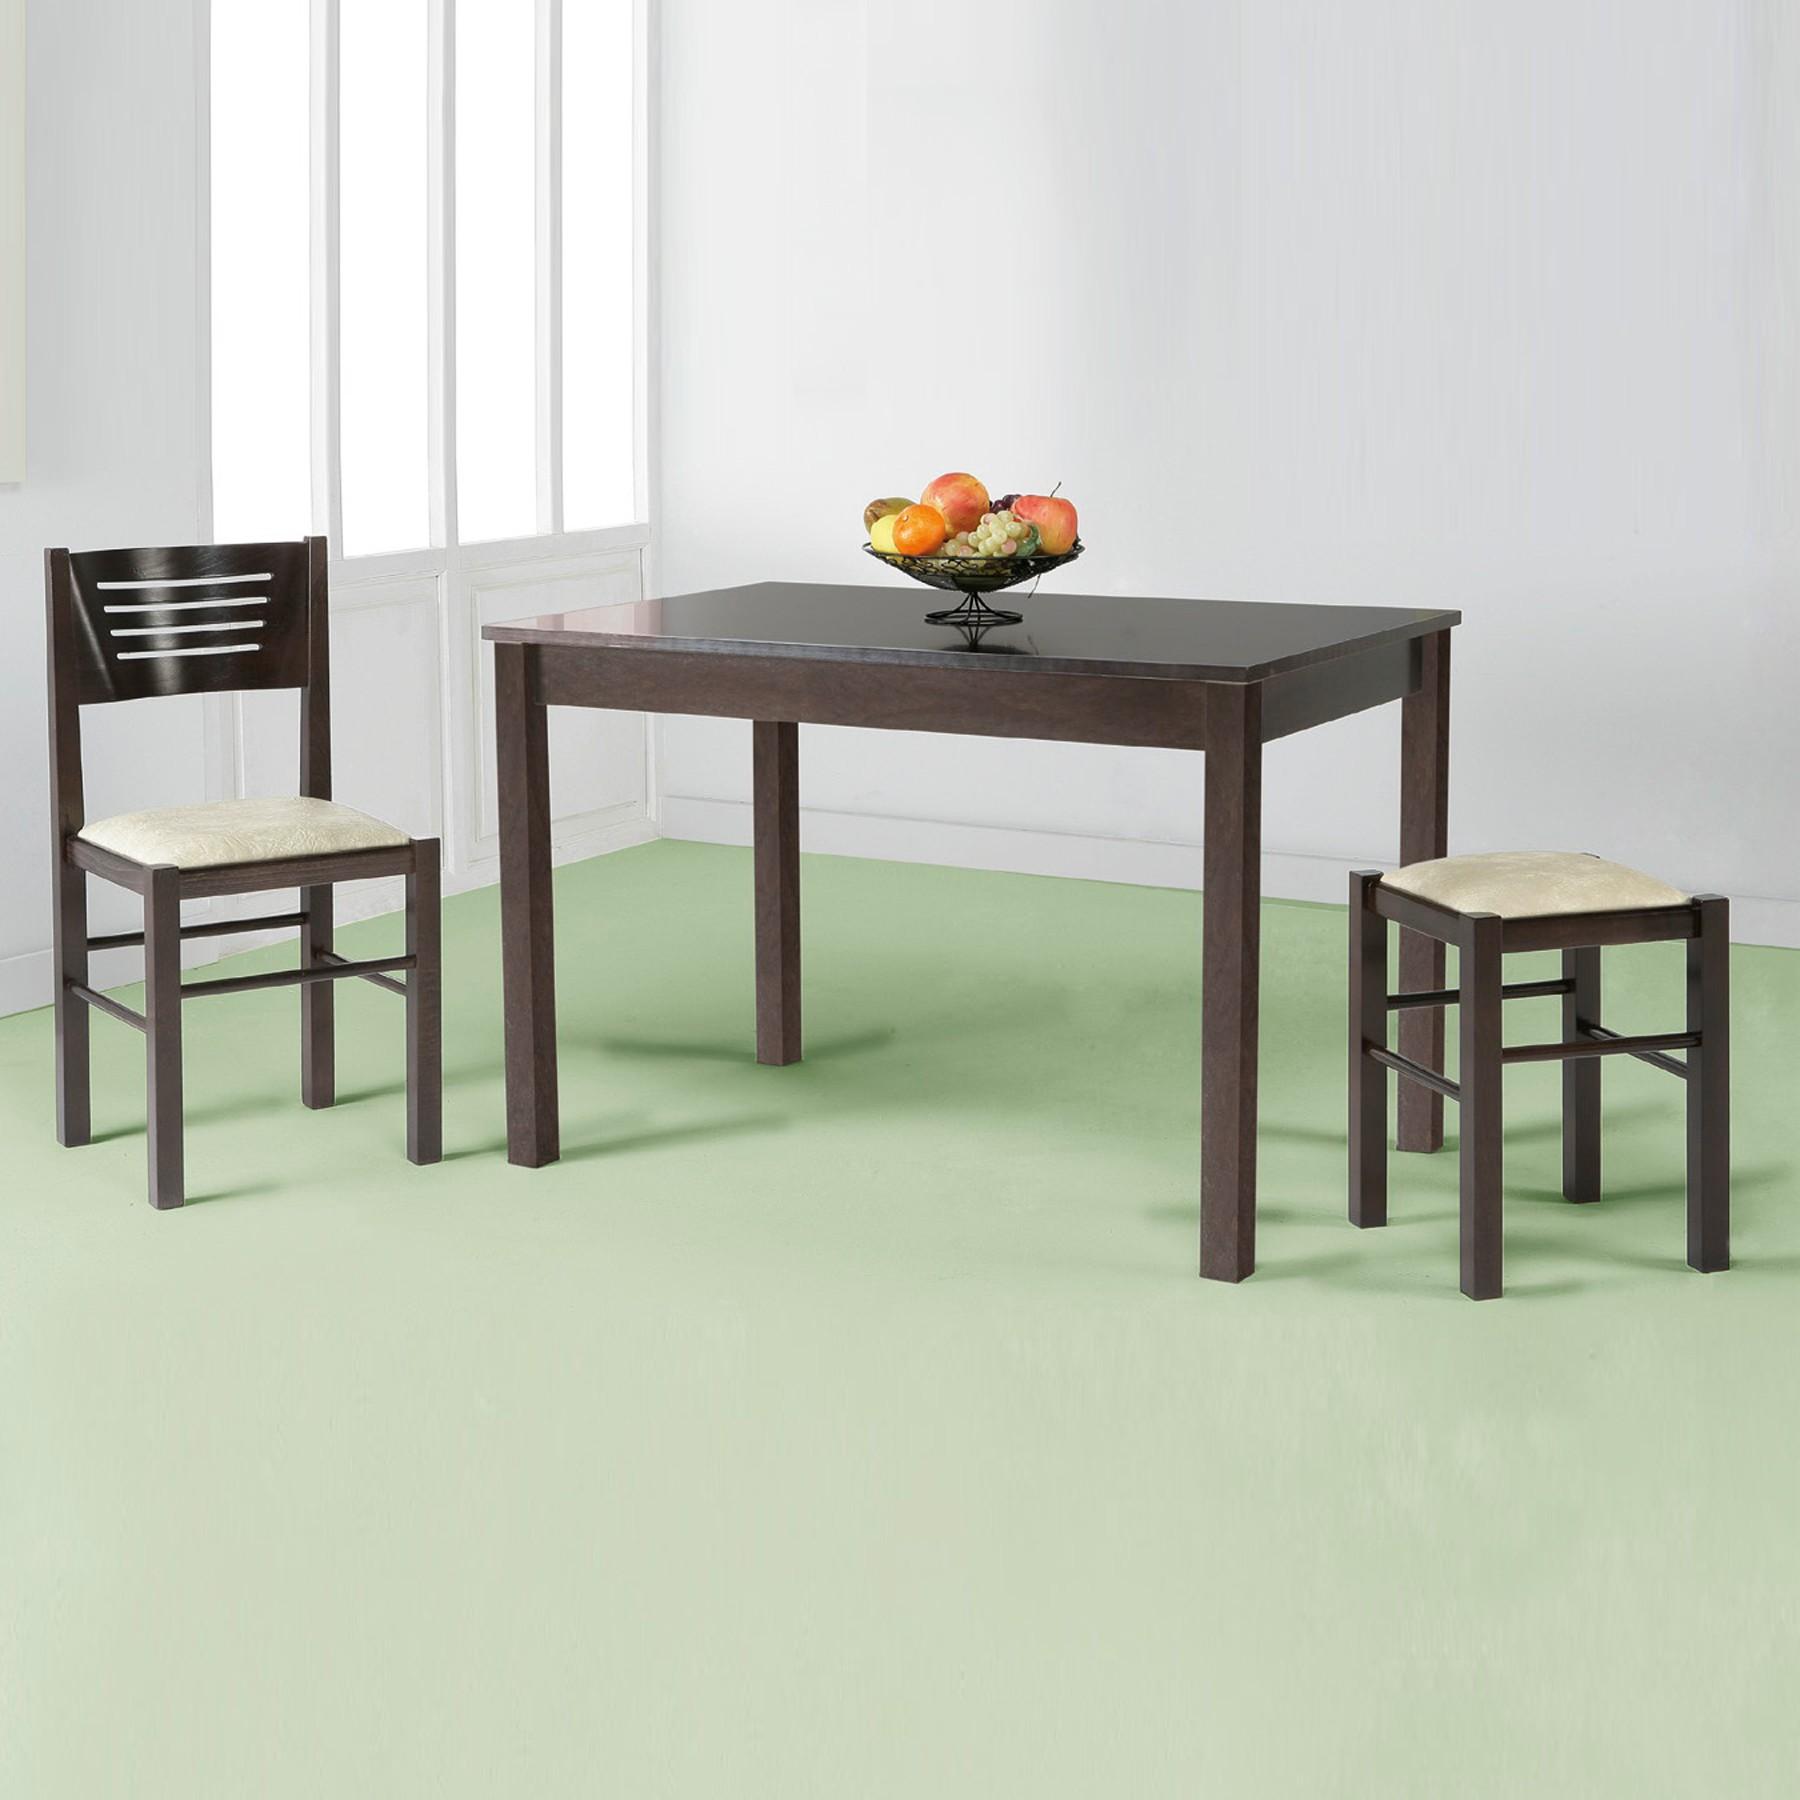 Mesa de cocina y comedor fija en madera modelo persimo - Mesas de cocina de madera extensibles ...